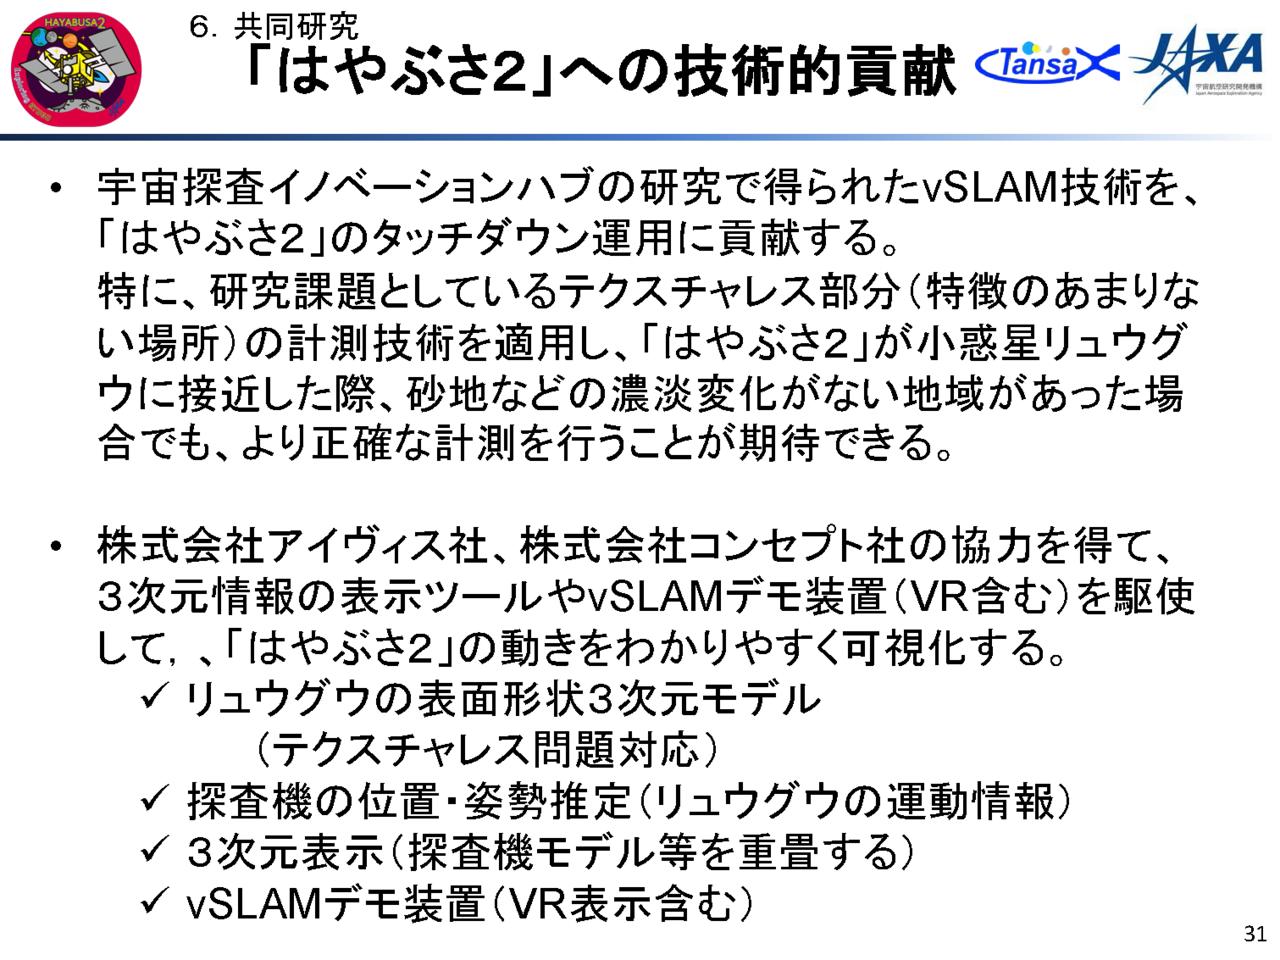 f:id:Imamura:20180802145951p:plain